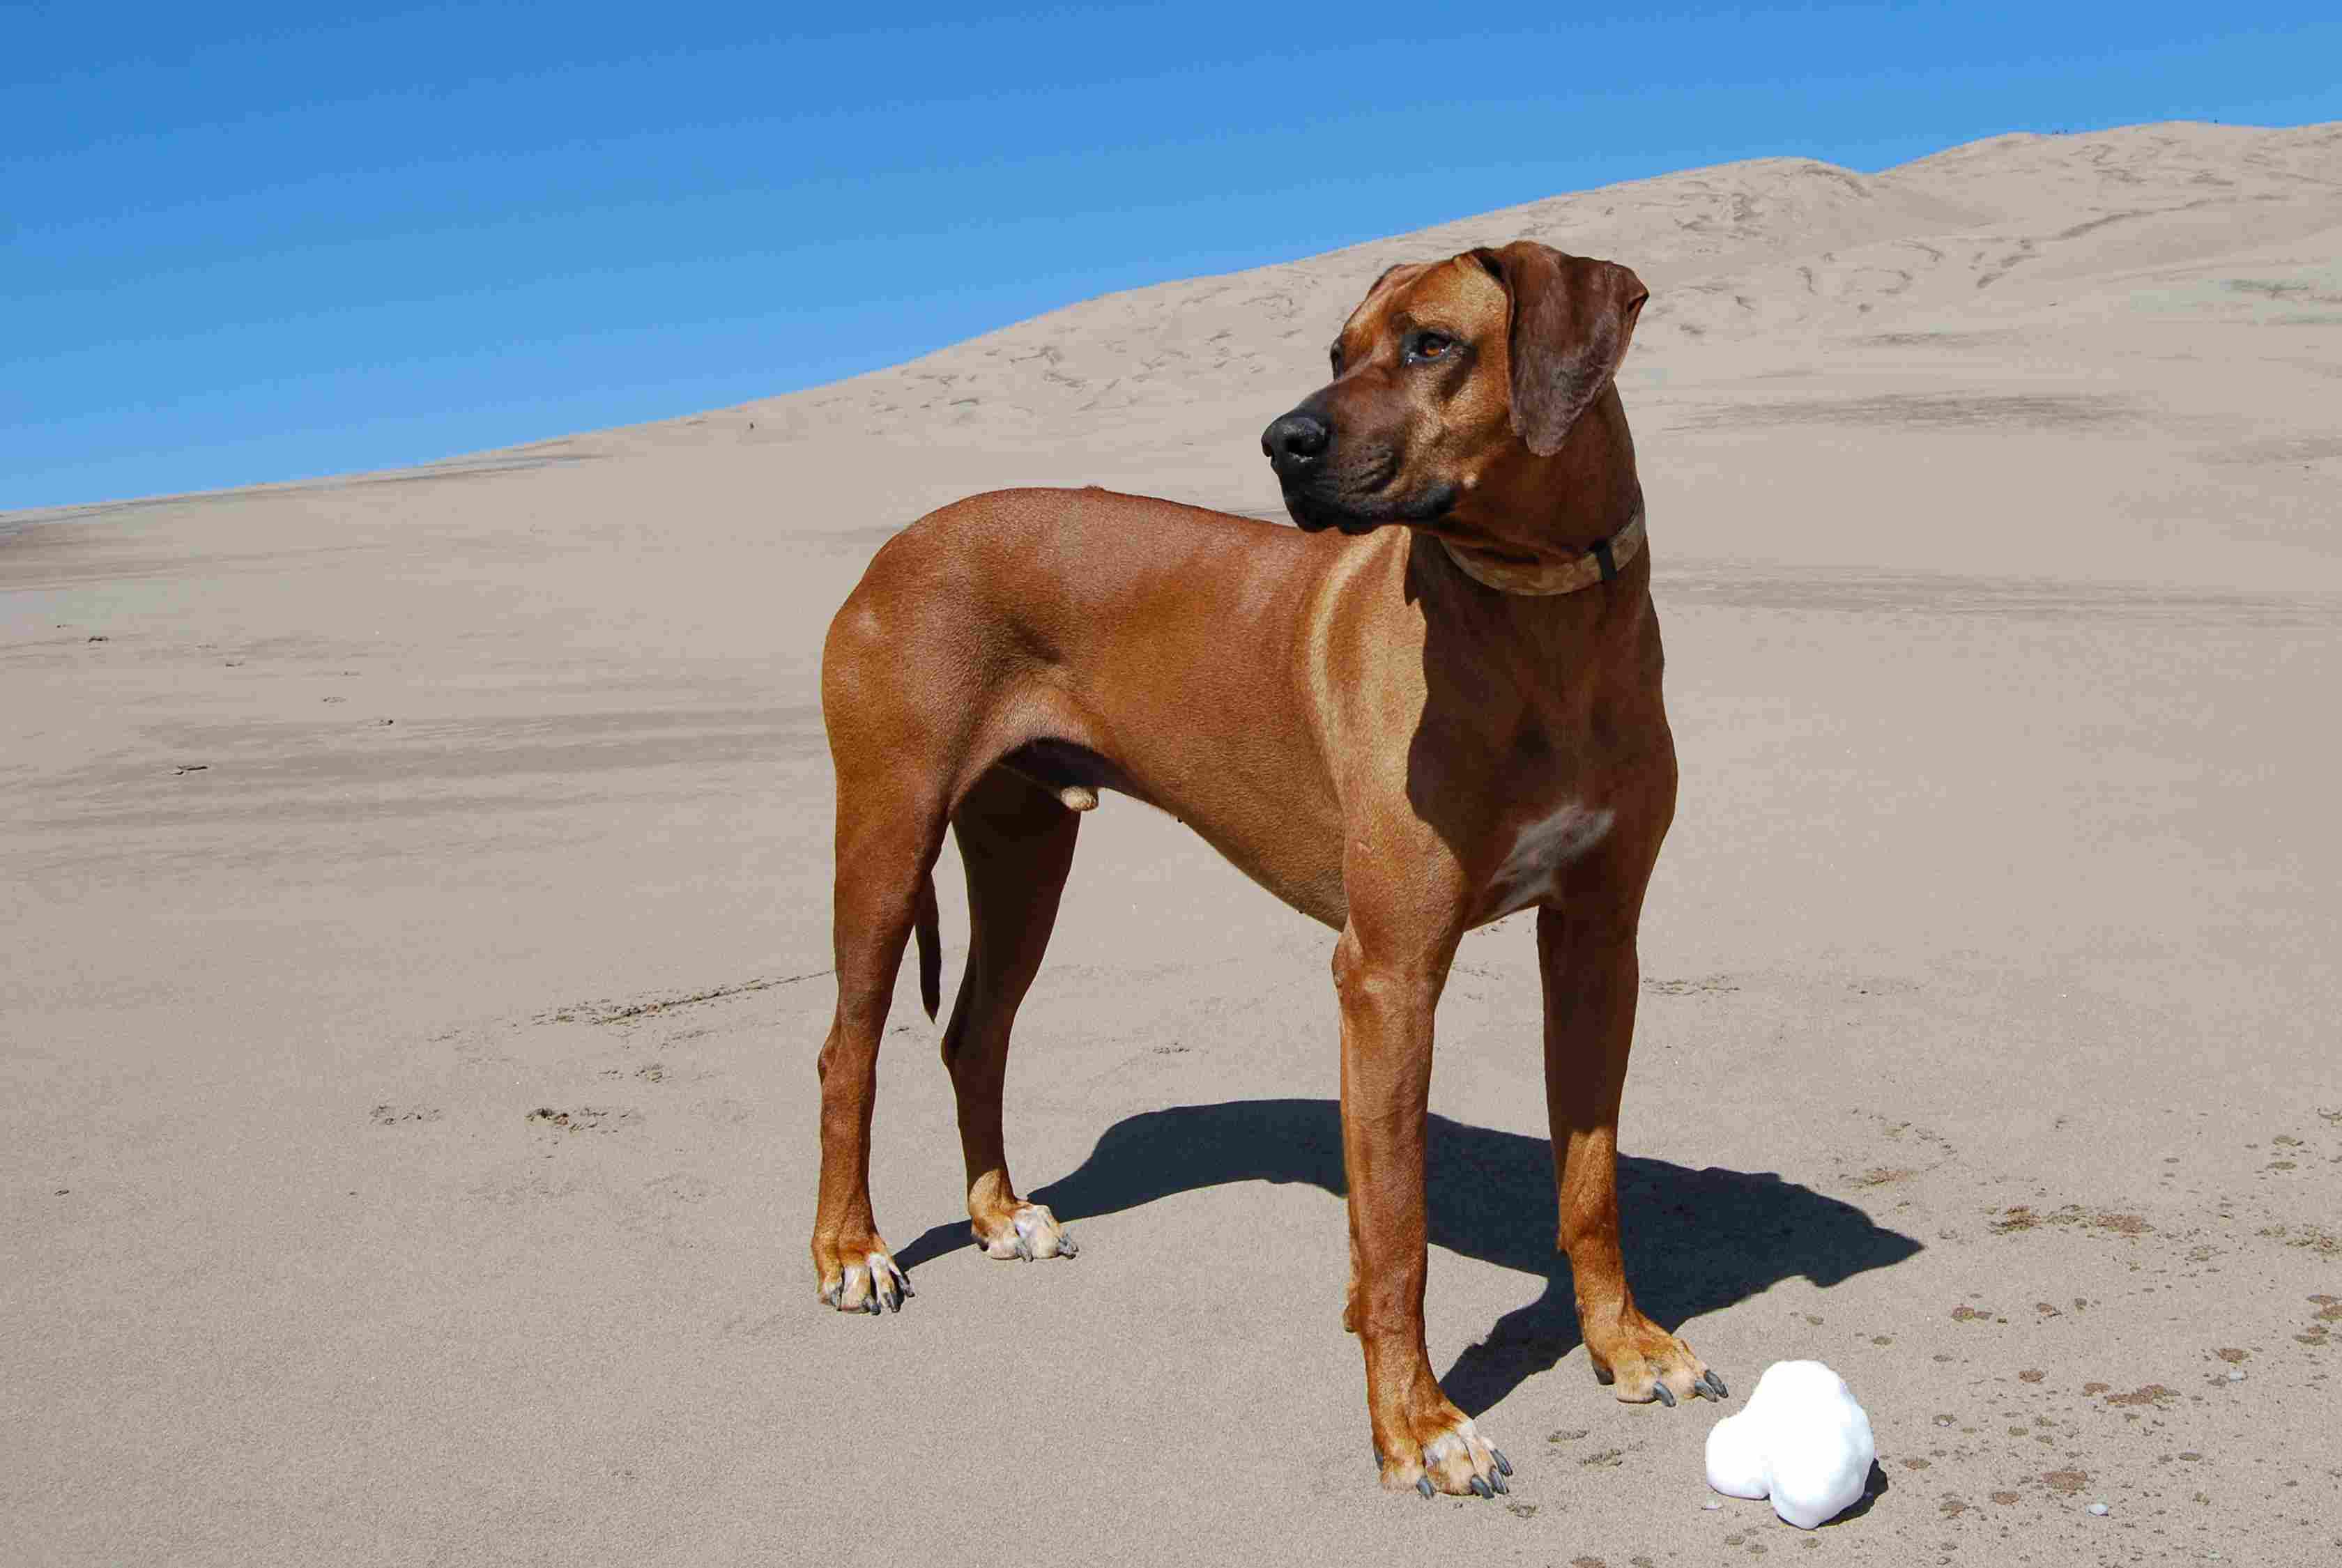 Rhodesian ridgeback dog on sand dunes